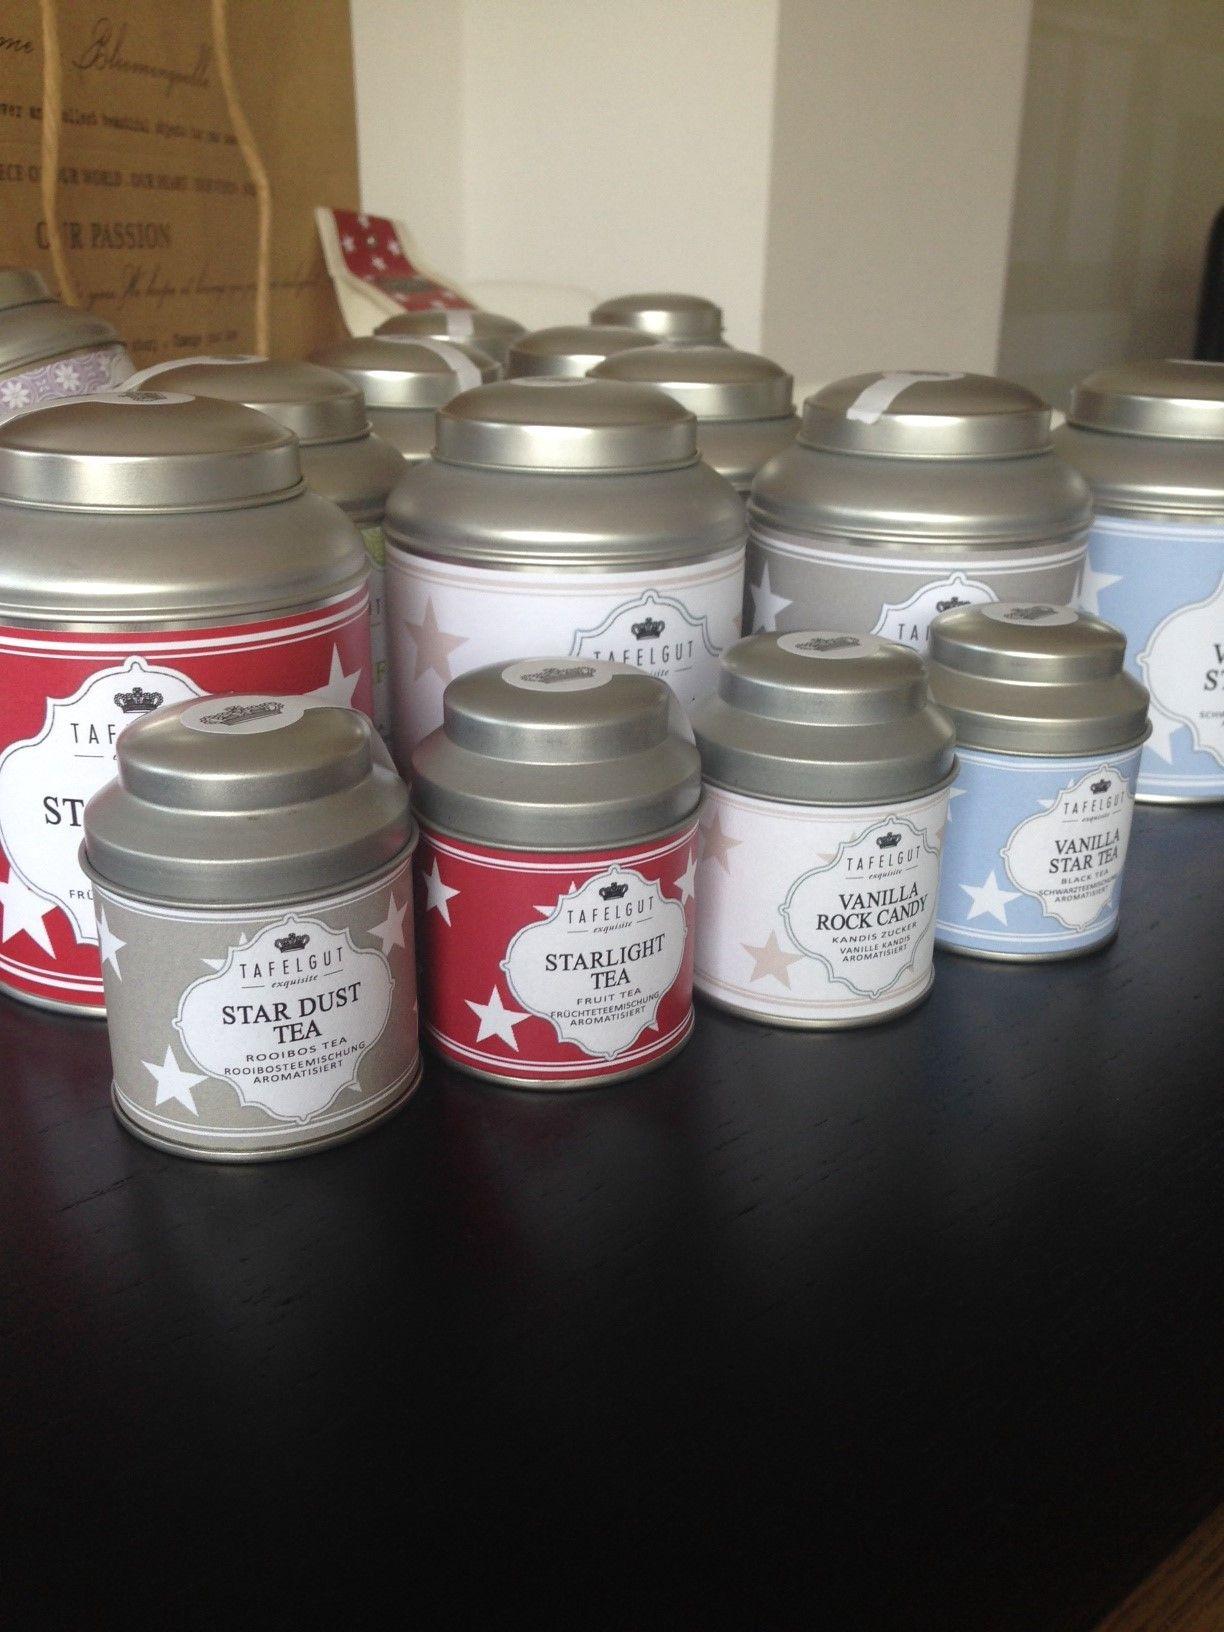 Kolekce čajů STAR Tafelgut